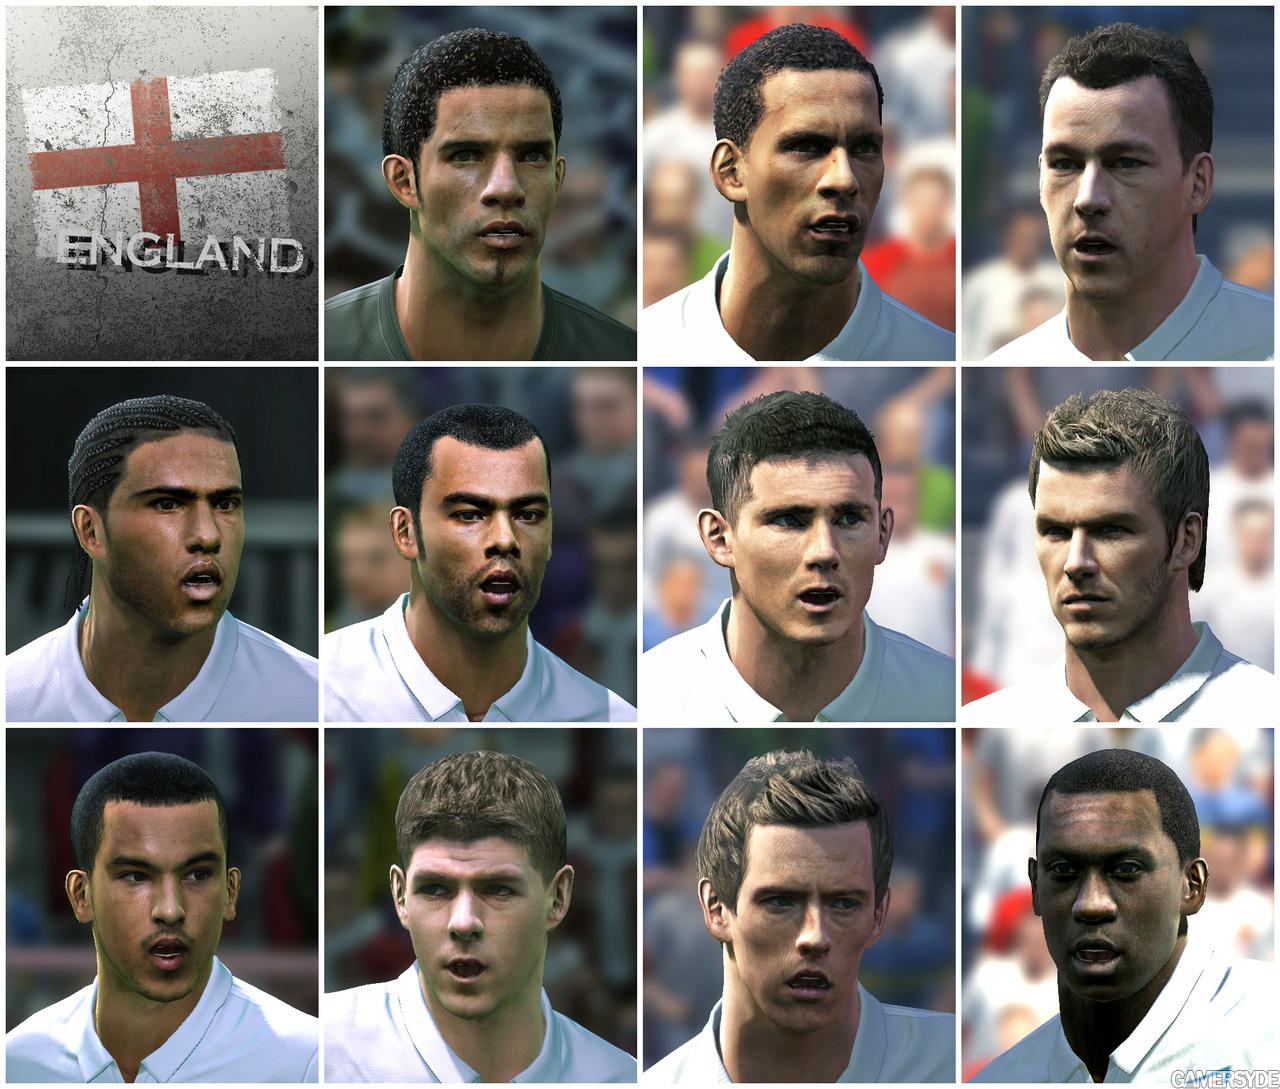 image_pro_evolution_soccer_2010-11663-1871_0001.jpg